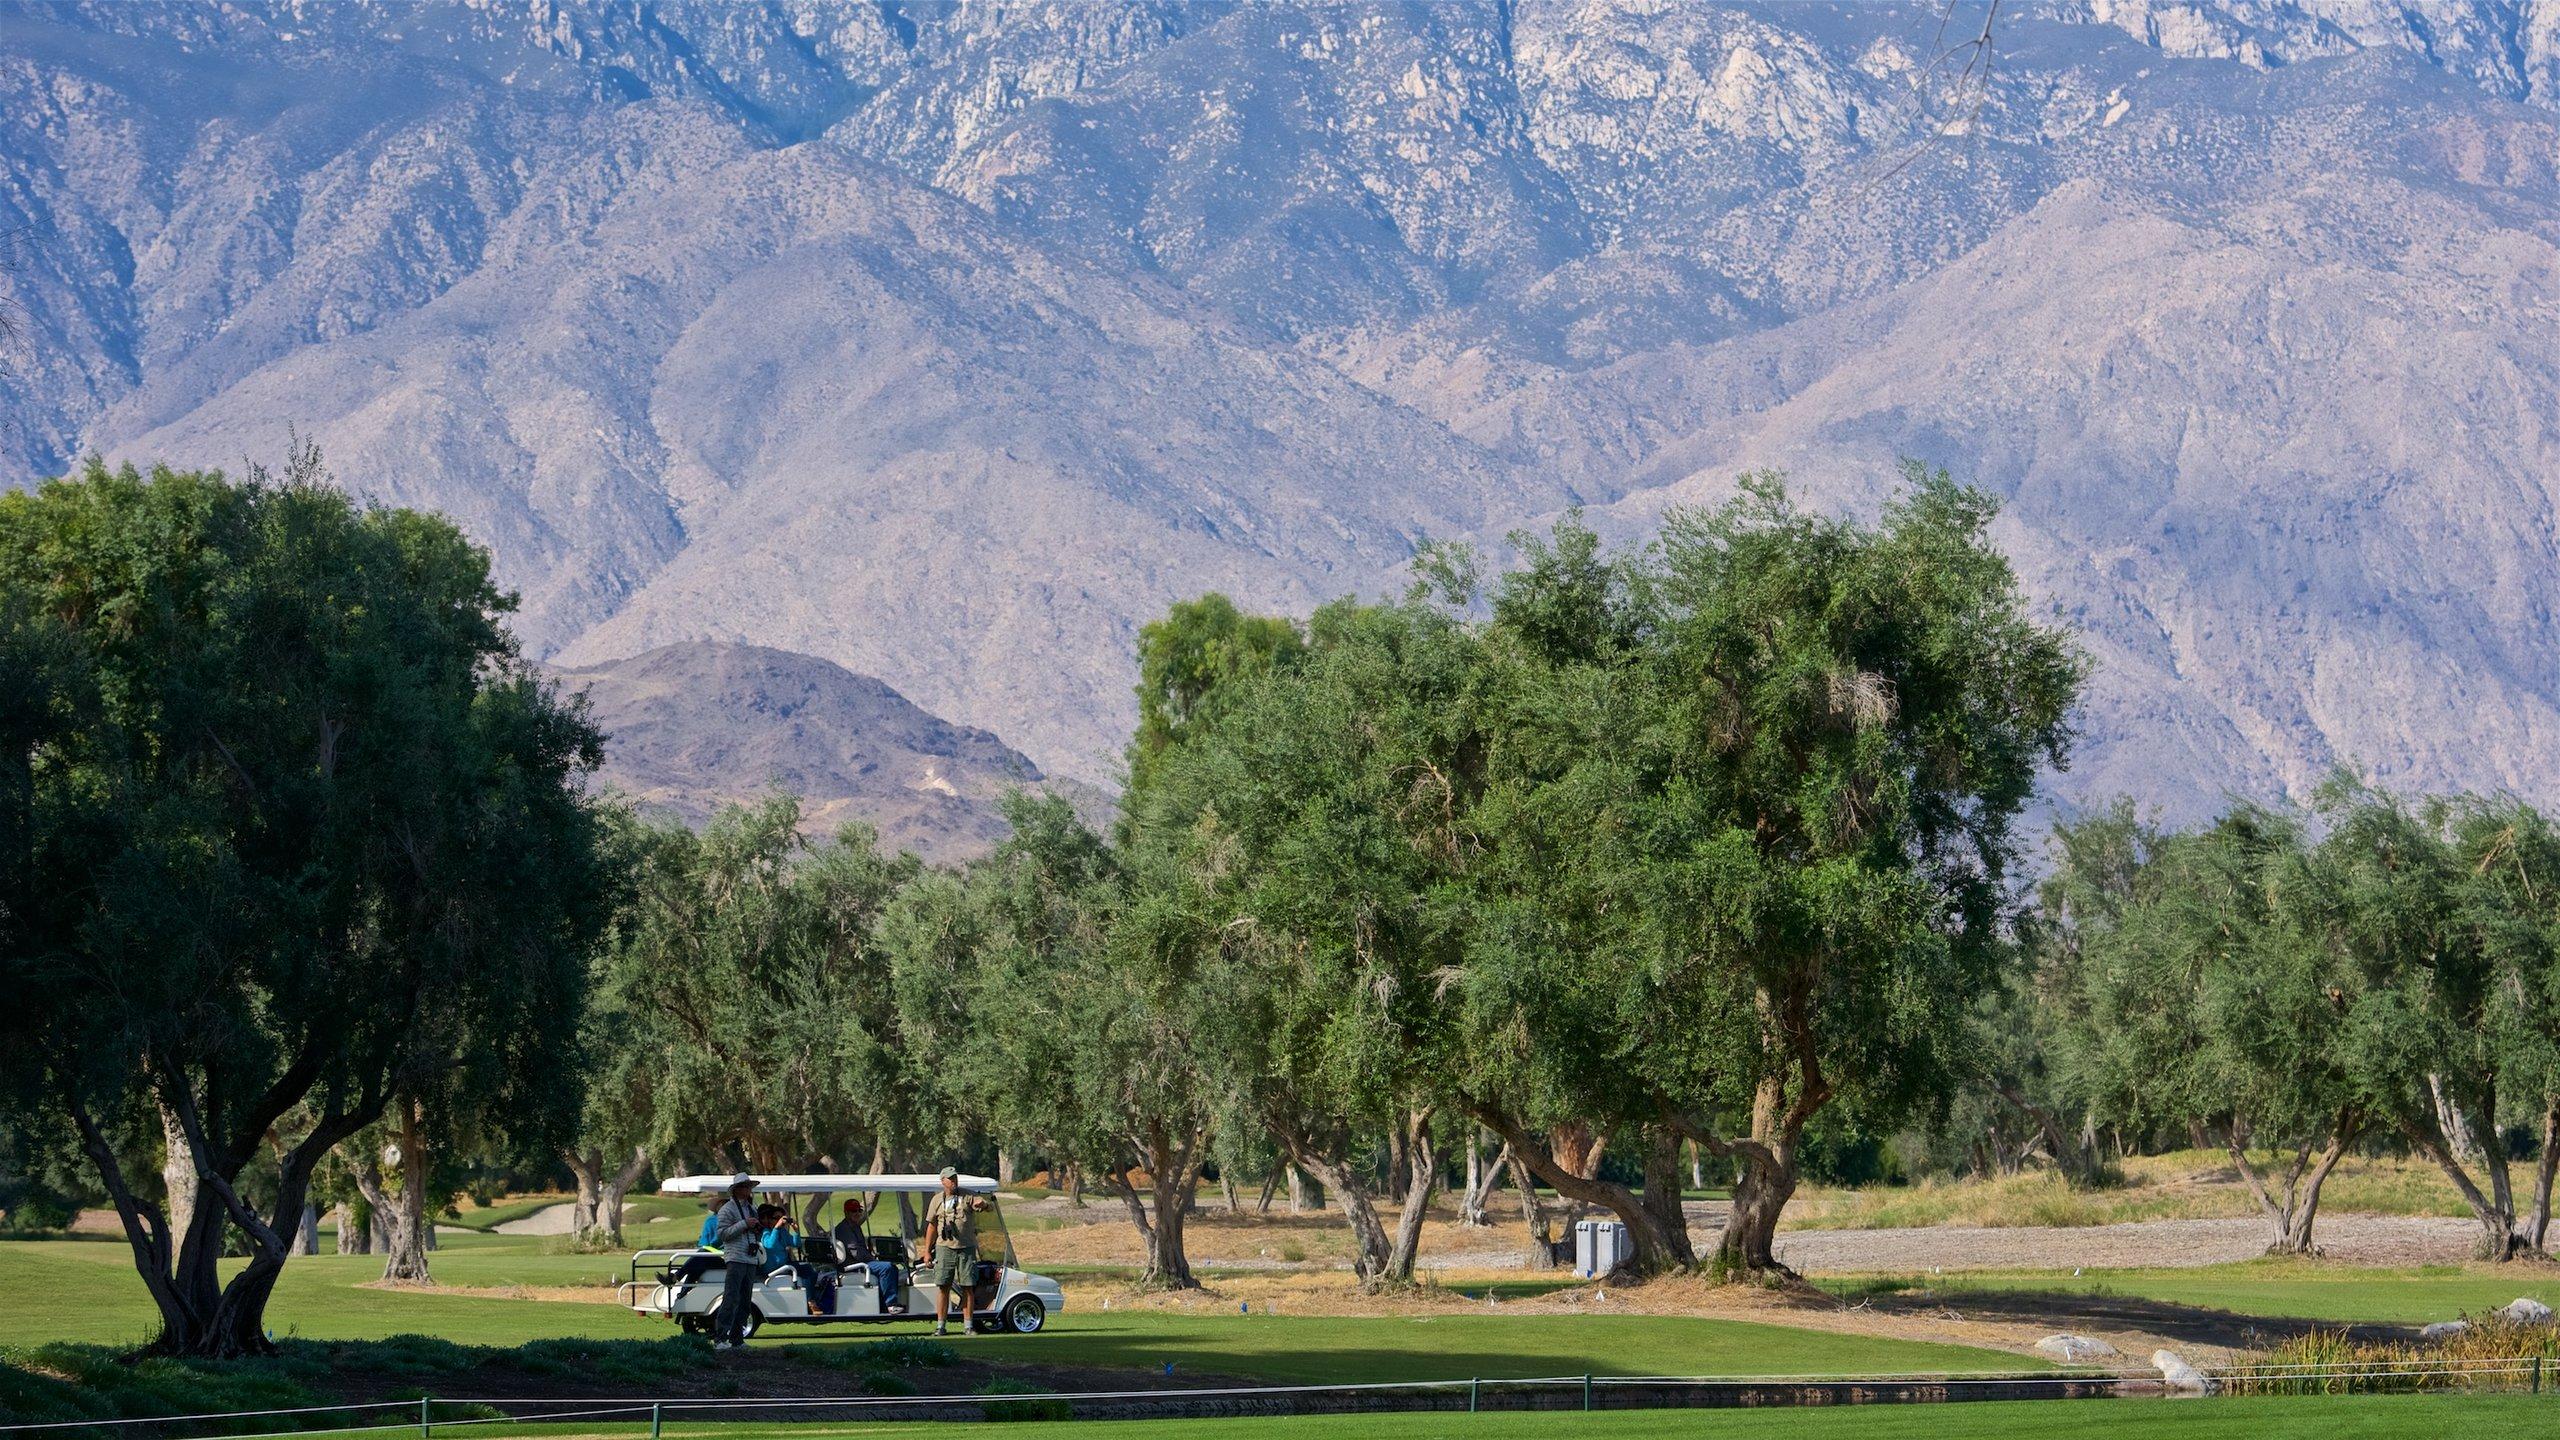 Rancho Mirage, California, United States of America